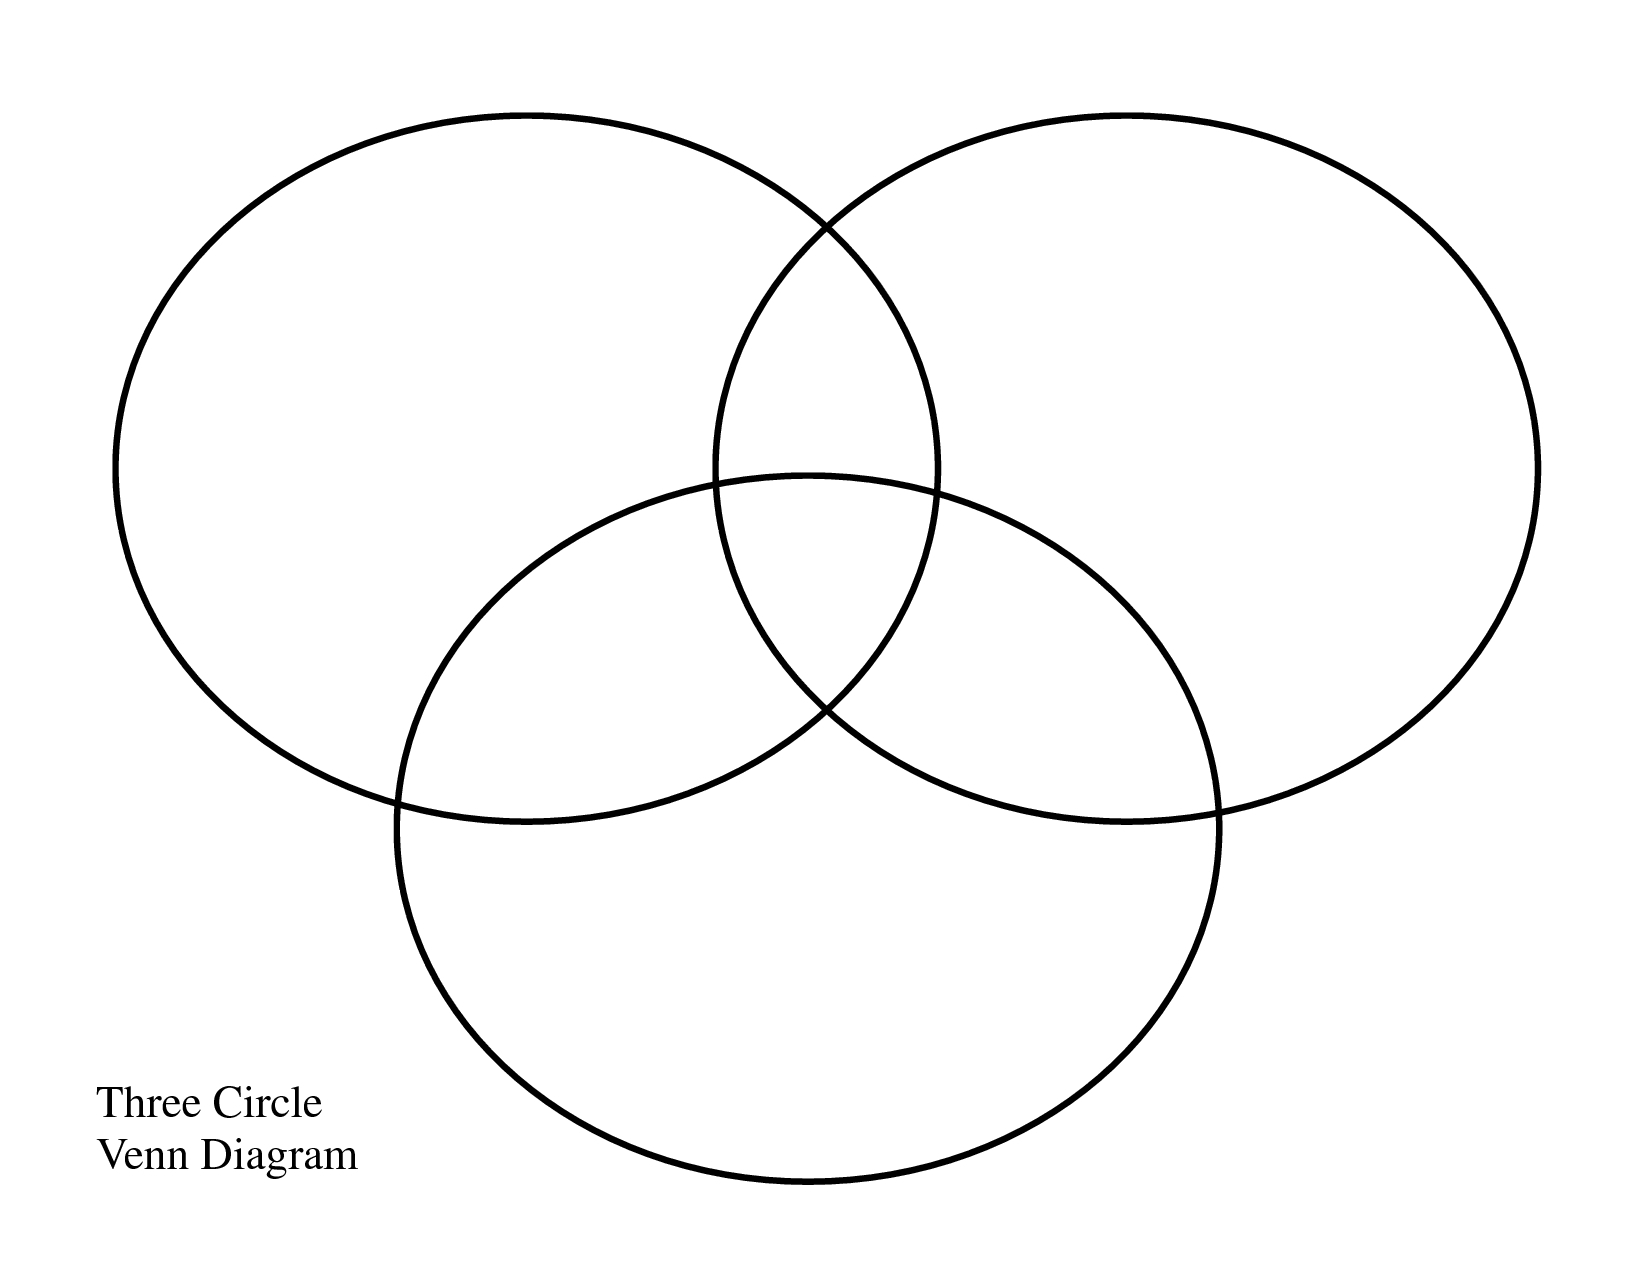 Venn Diagram Printable 3 Blank Diagram Diagrams And Formats Corner